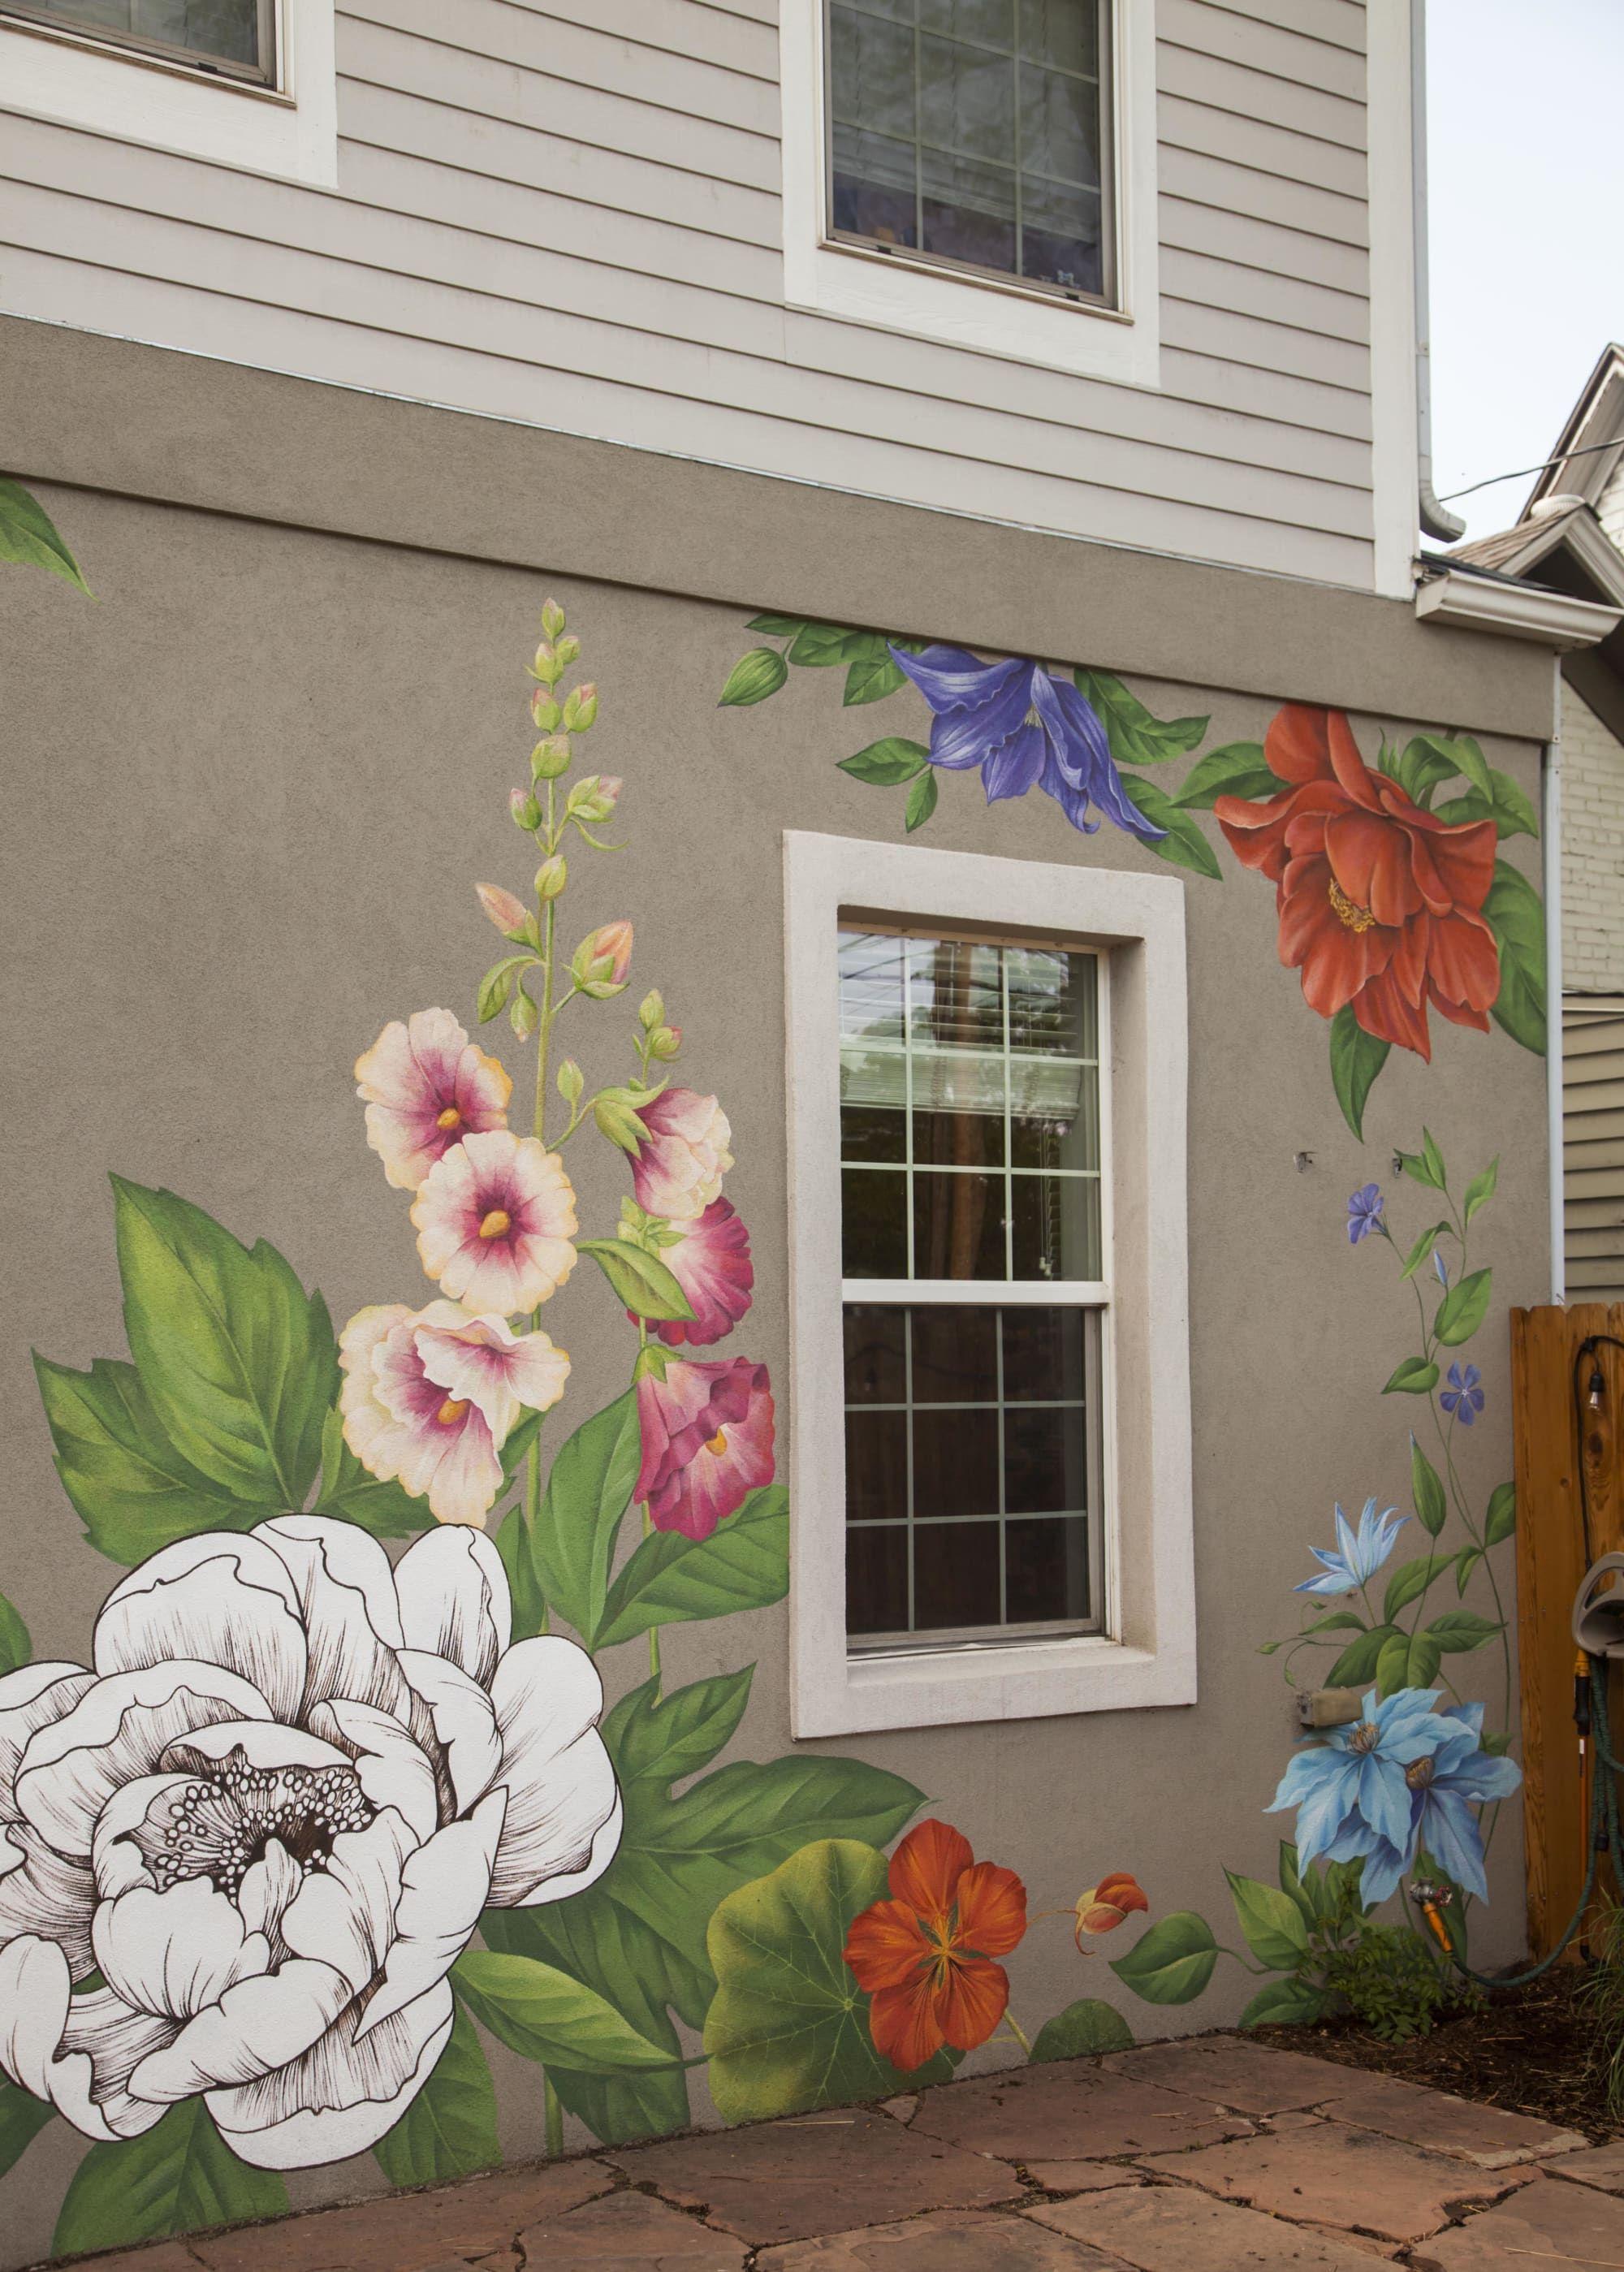 Murals by Yulia Avgustinovich at Private Residence, Denver - Flower Wall Mural